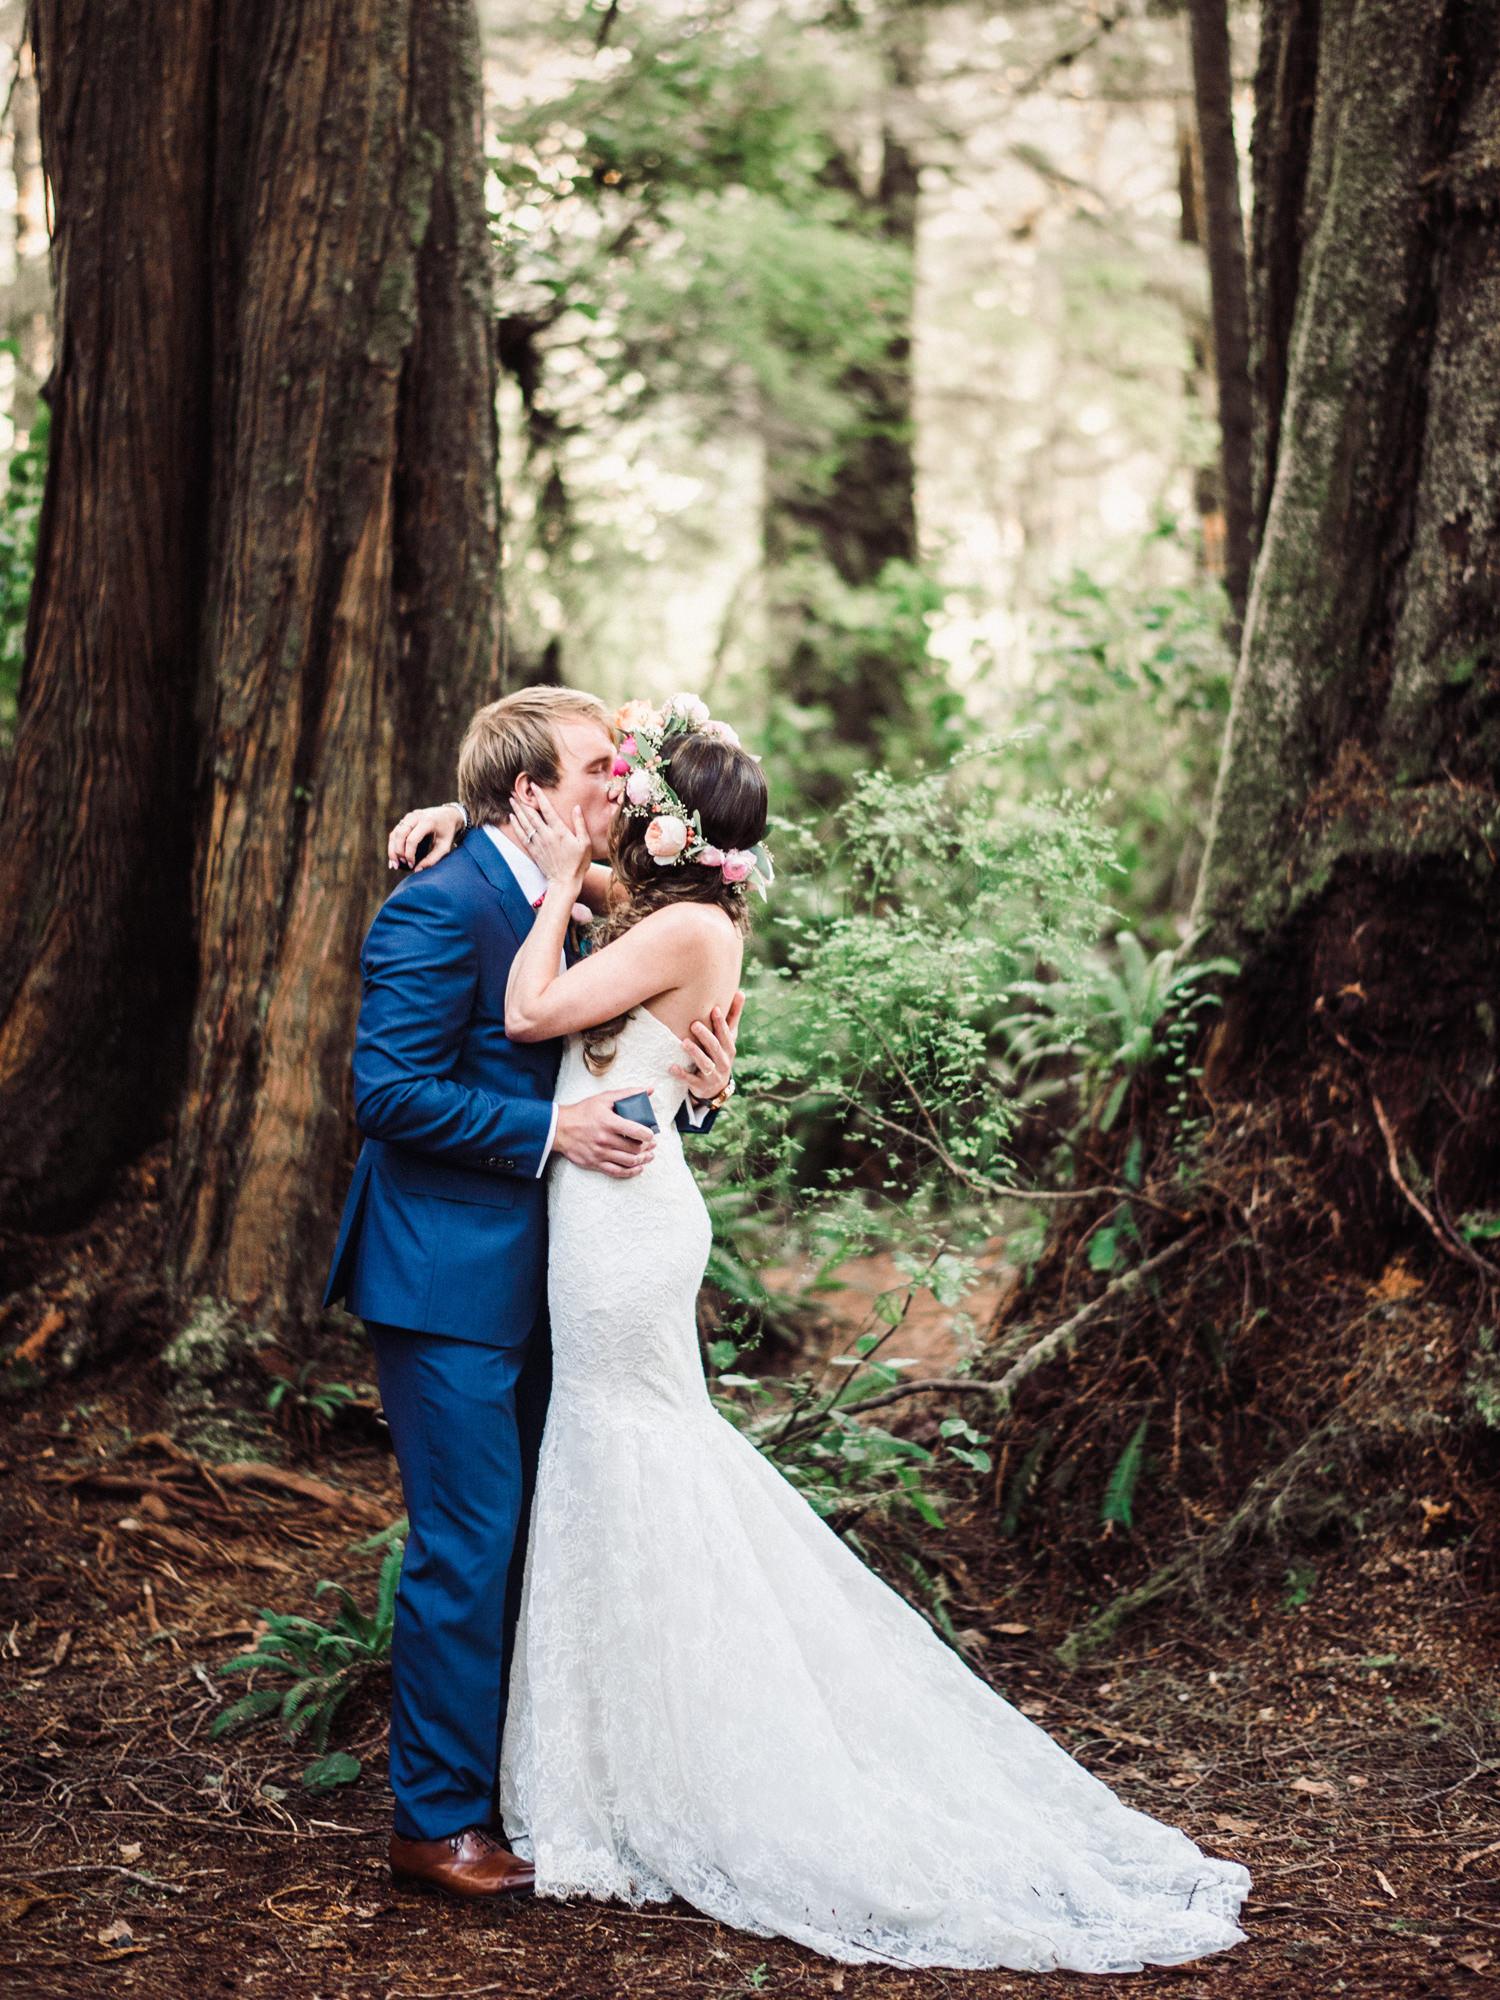 wickaninnish-inn-tofino-bc-elopement-ryan-flynn-photography-00049.JPG